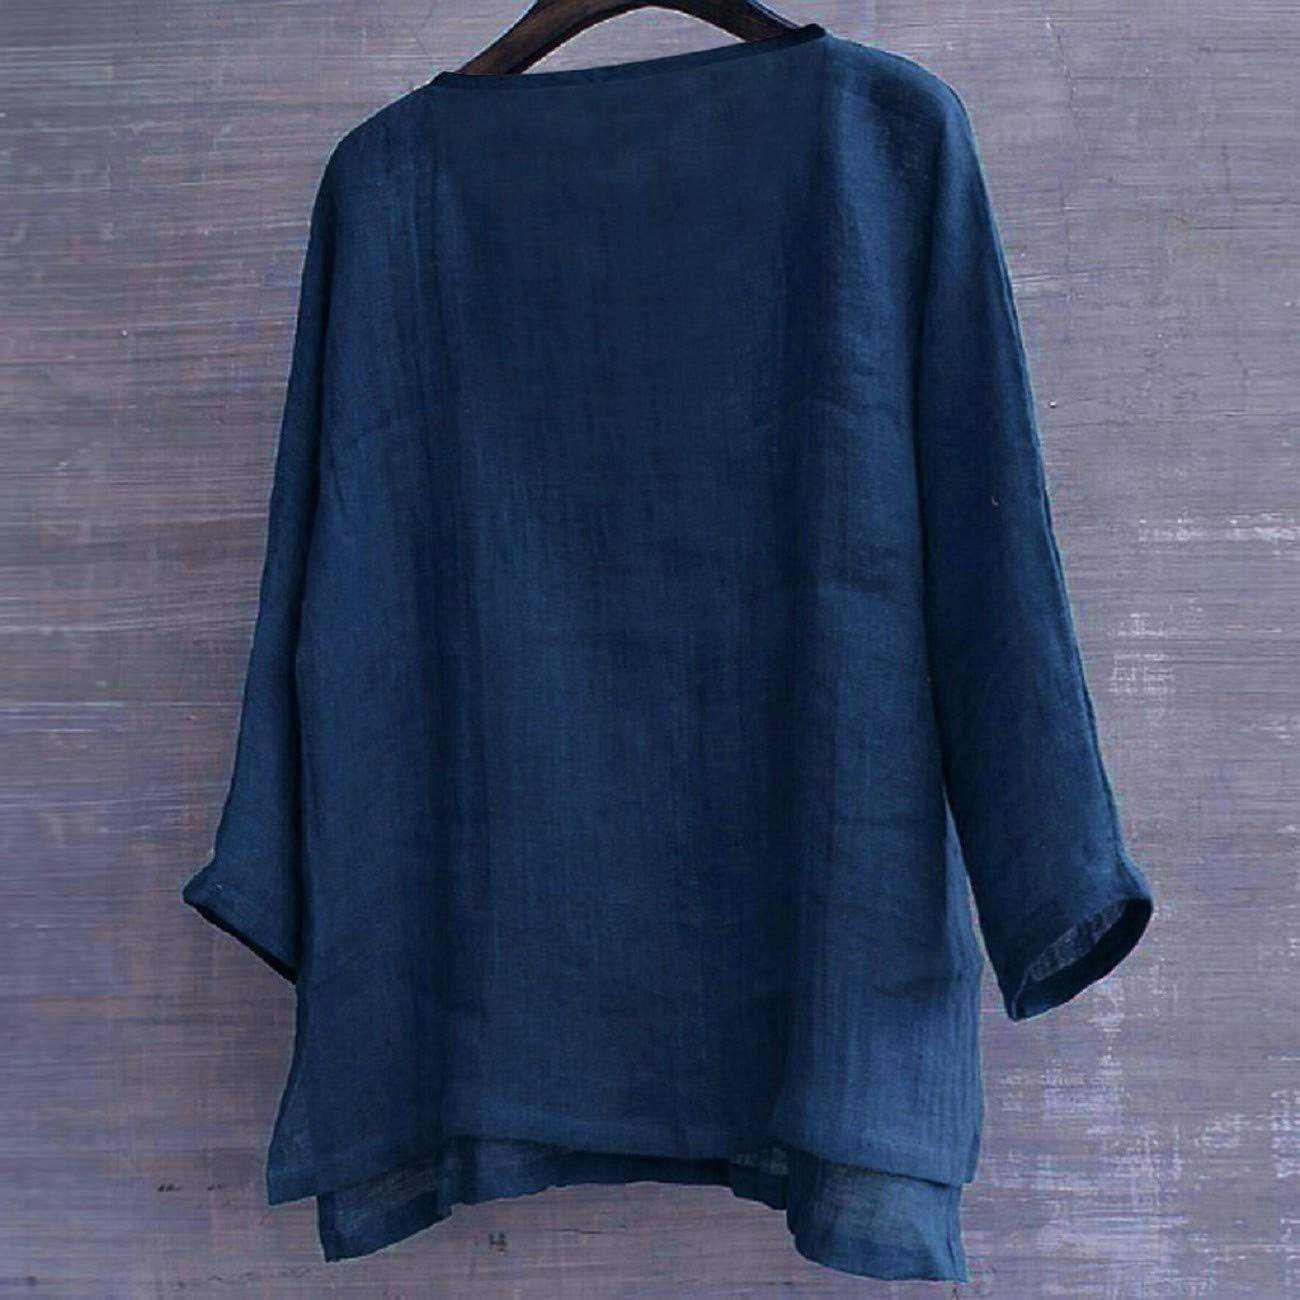 Mens Brief Breathable Comfy Solid Color Long Sleeve Loose Casual T Shirt Blouse FAPIZI Men Cotton Linen Shirts